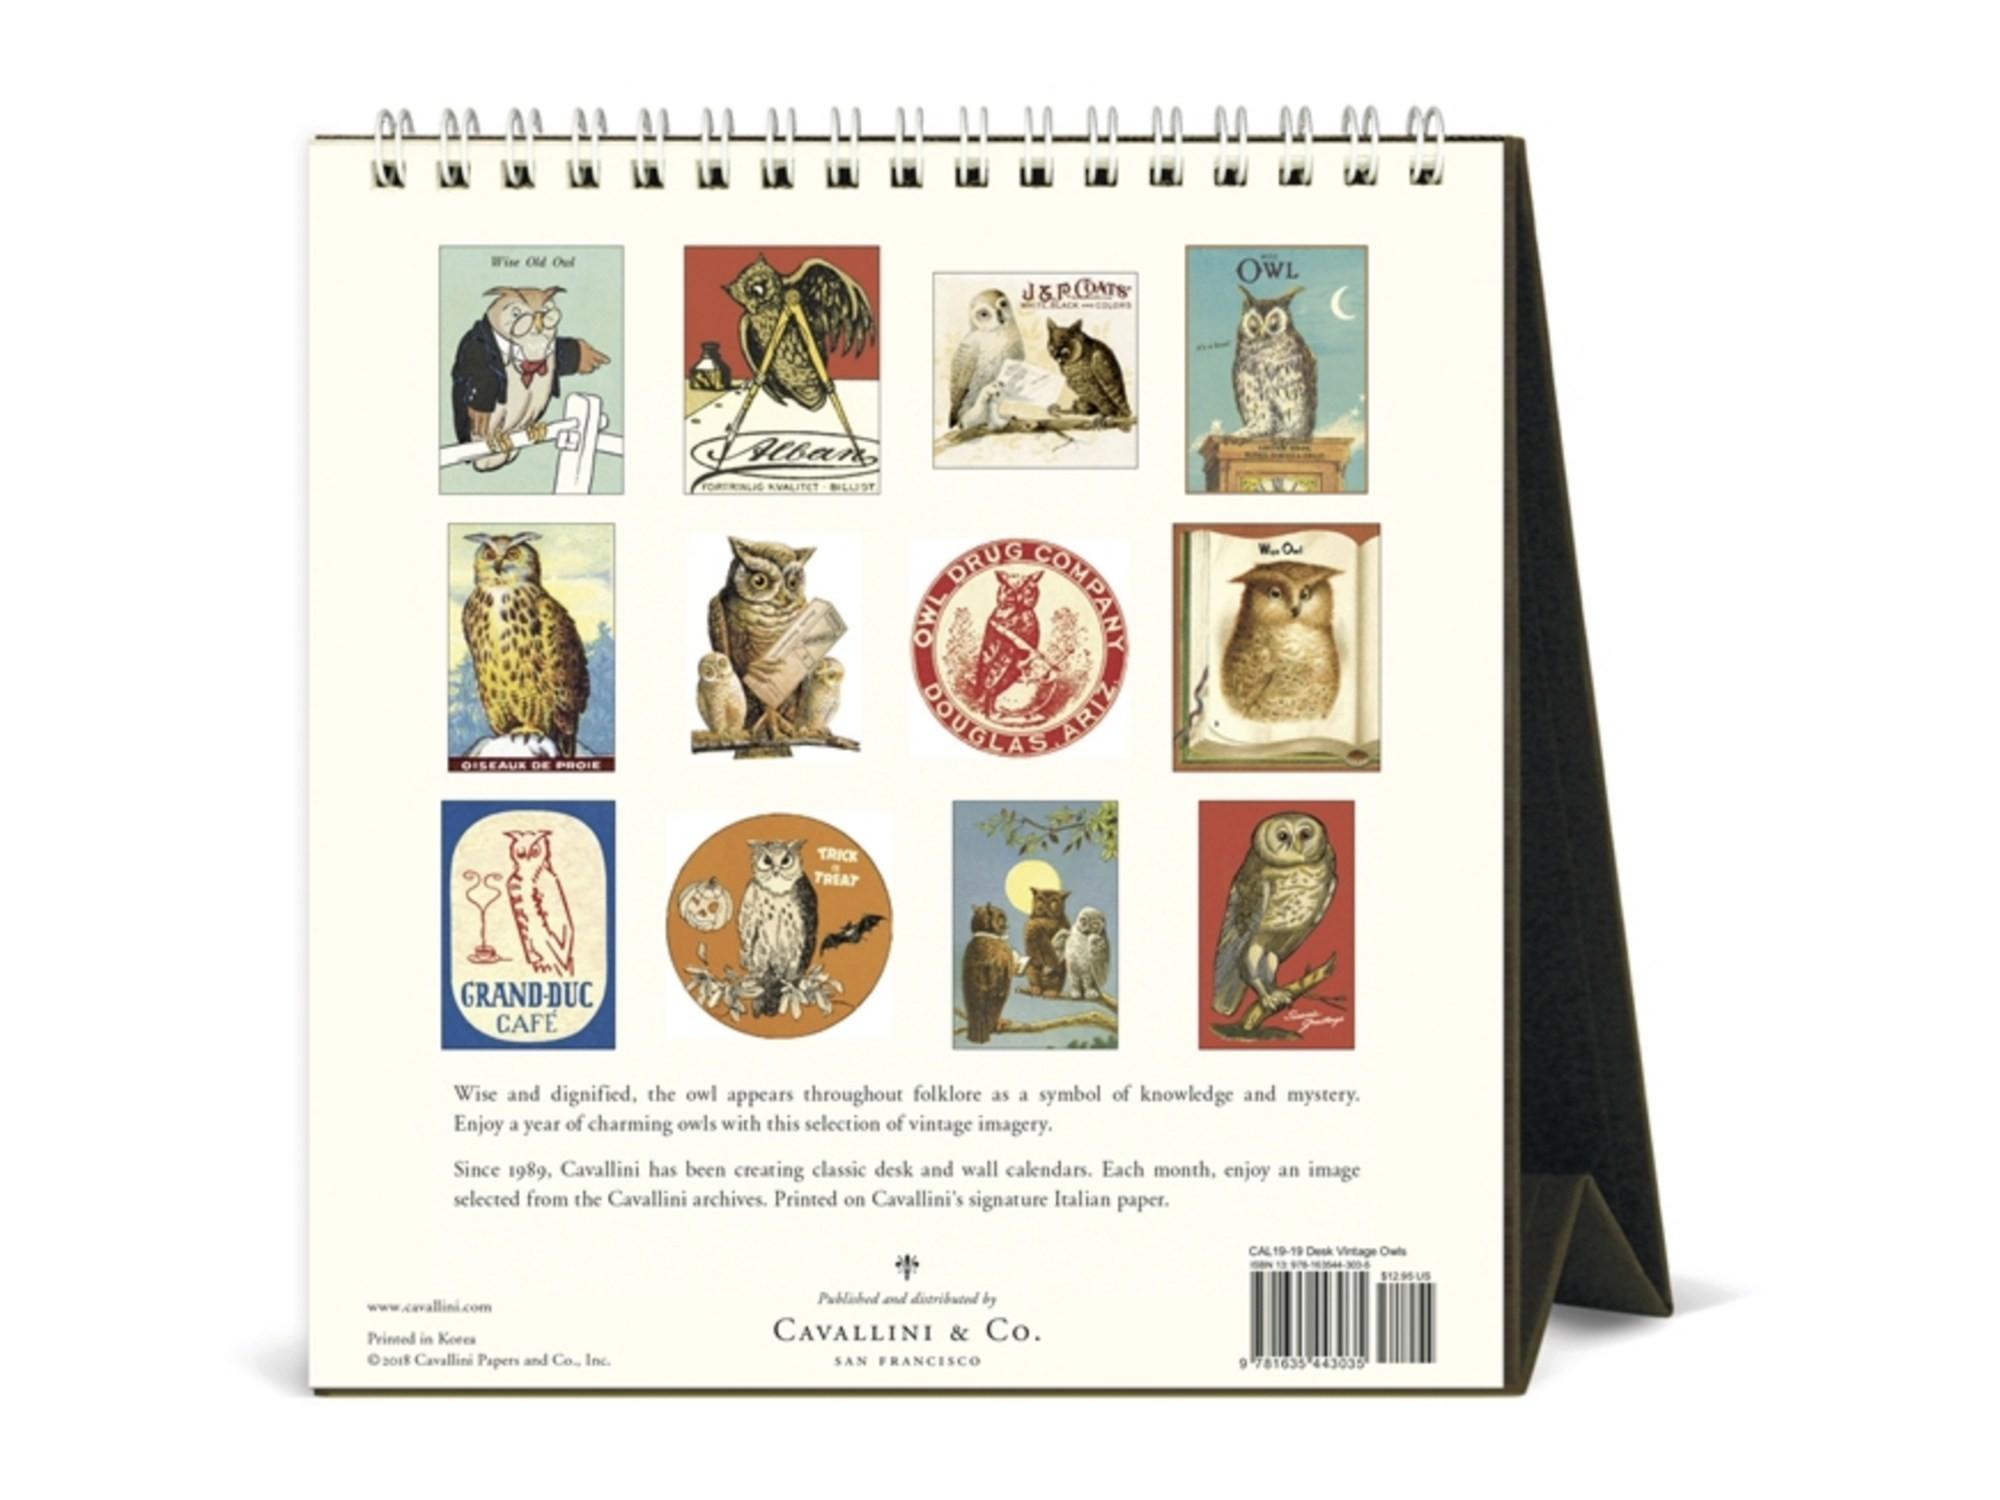 Desk Calendar Planner Cavallini 2019 Desk Calendar Vintage Owls